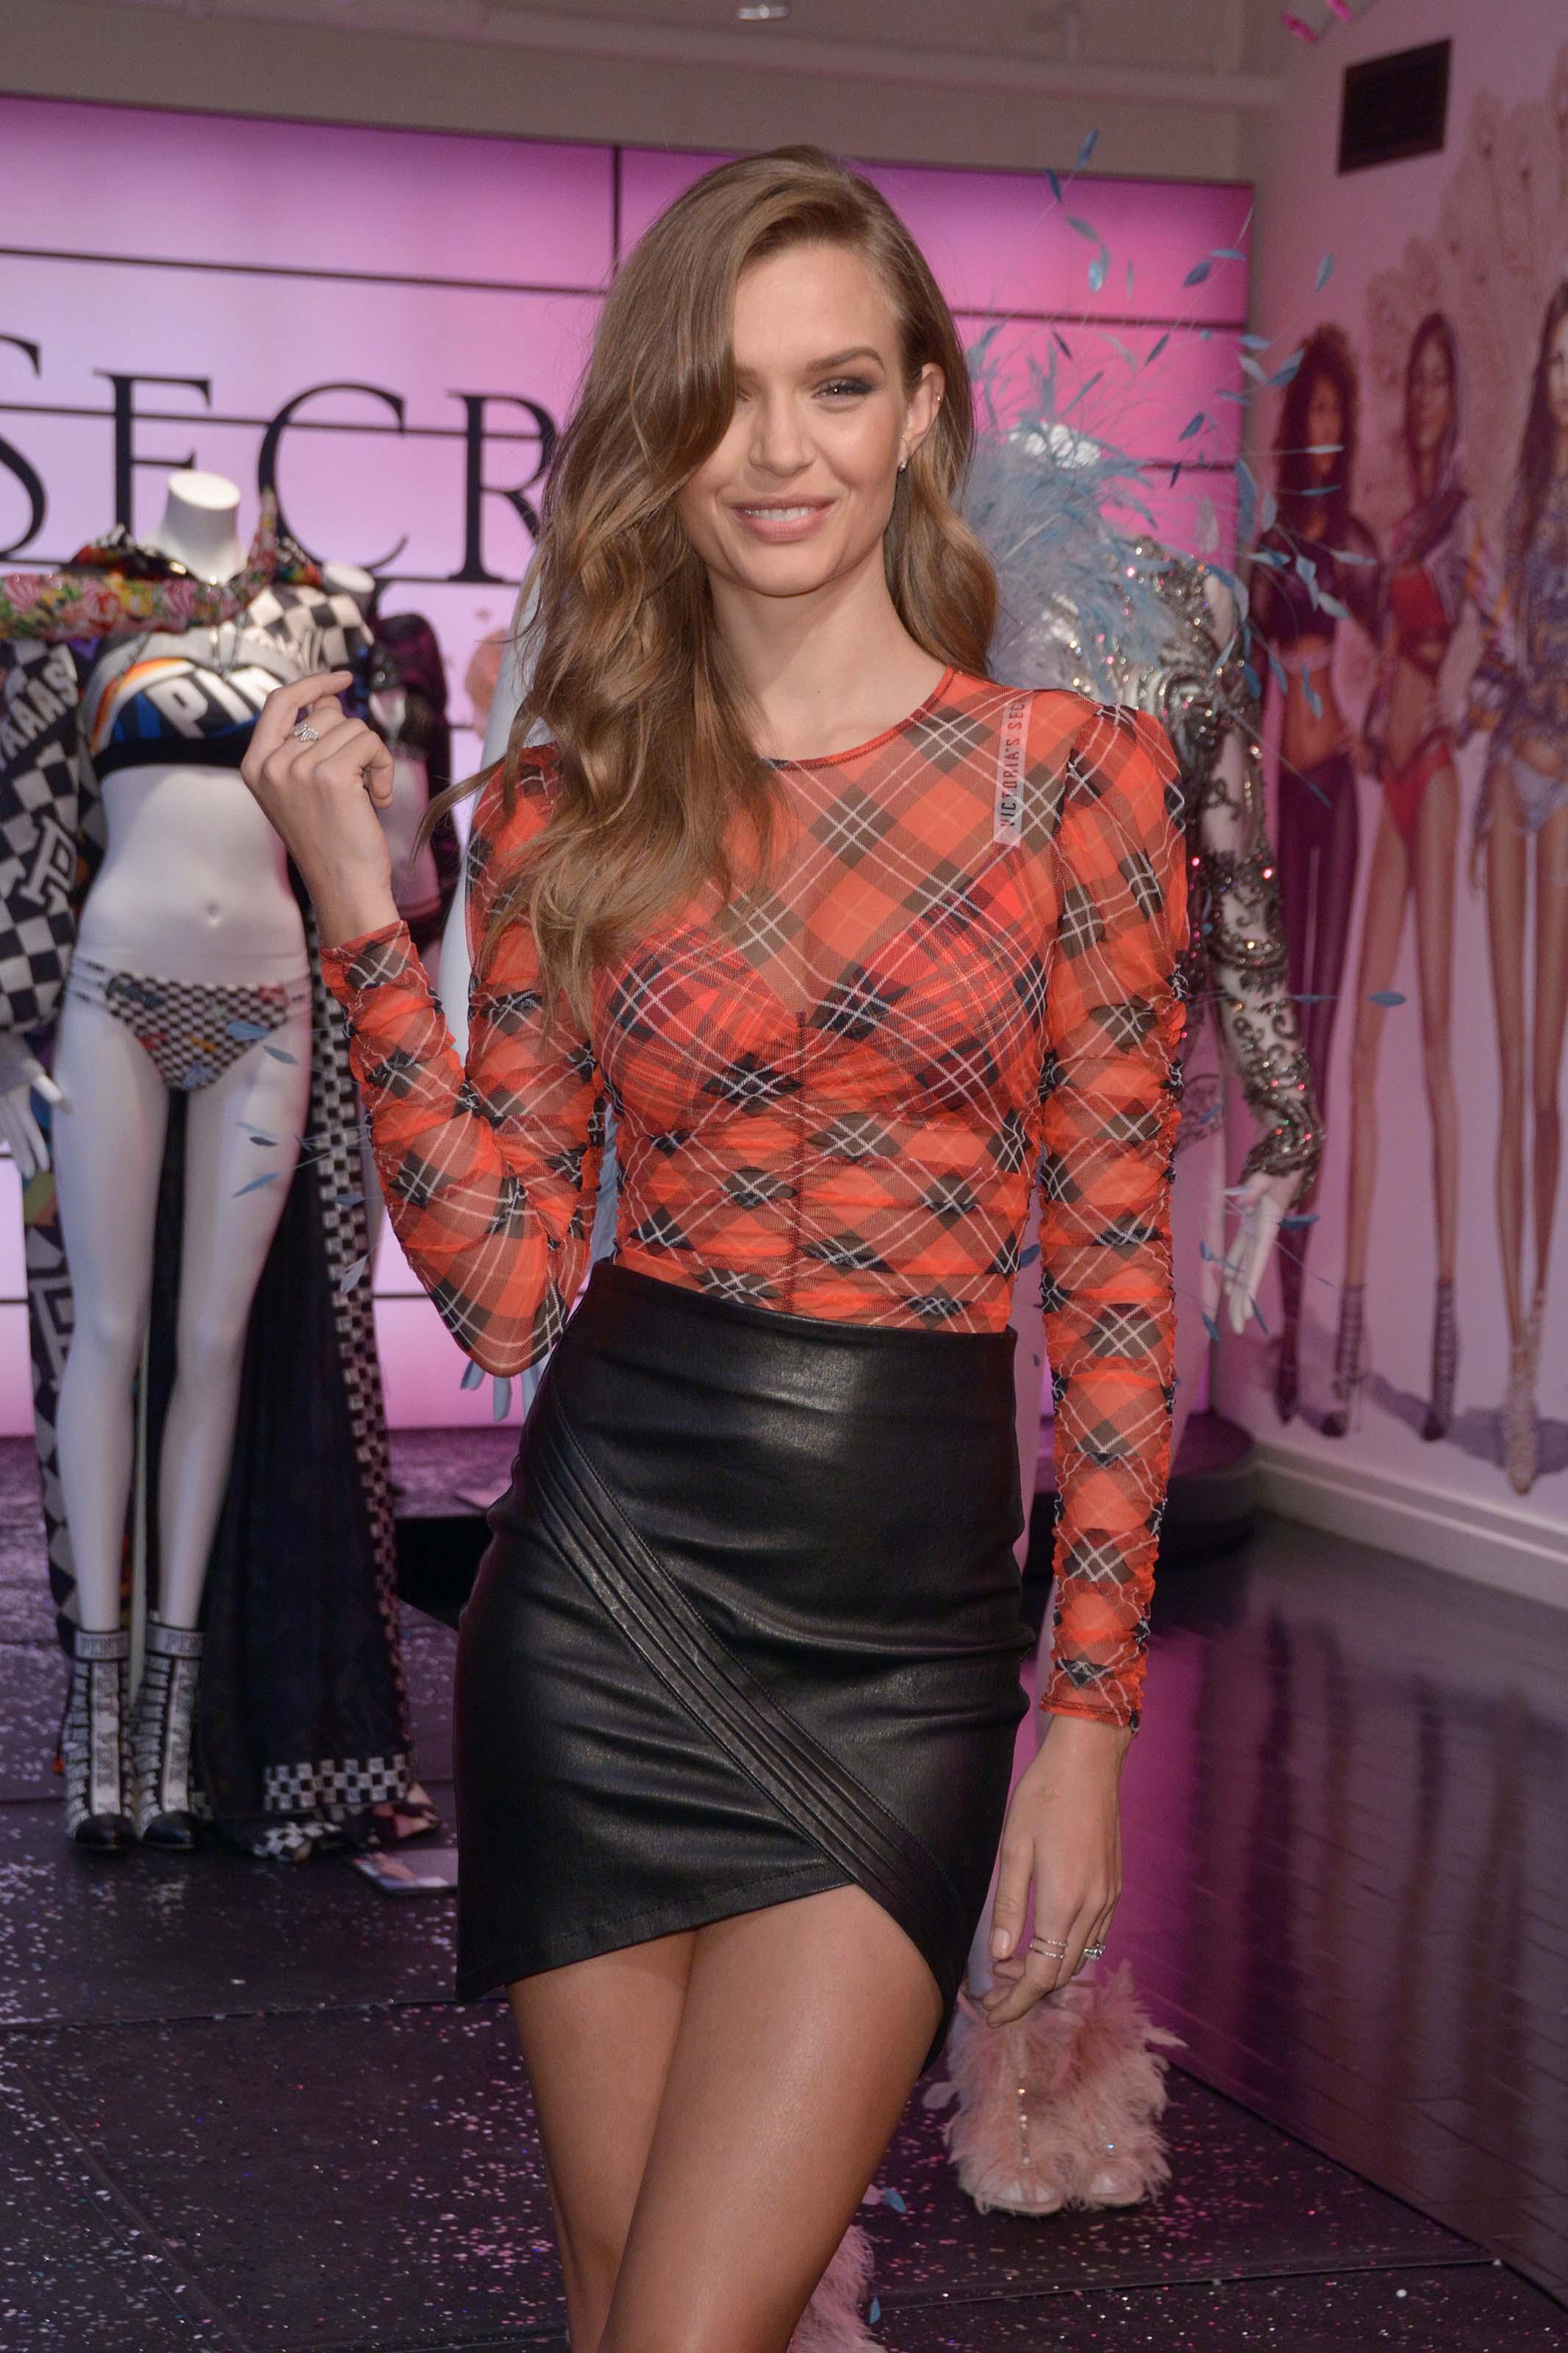 Josephine Skriver attends In New York City to Celebrate the Victoria Secret Fashion Show